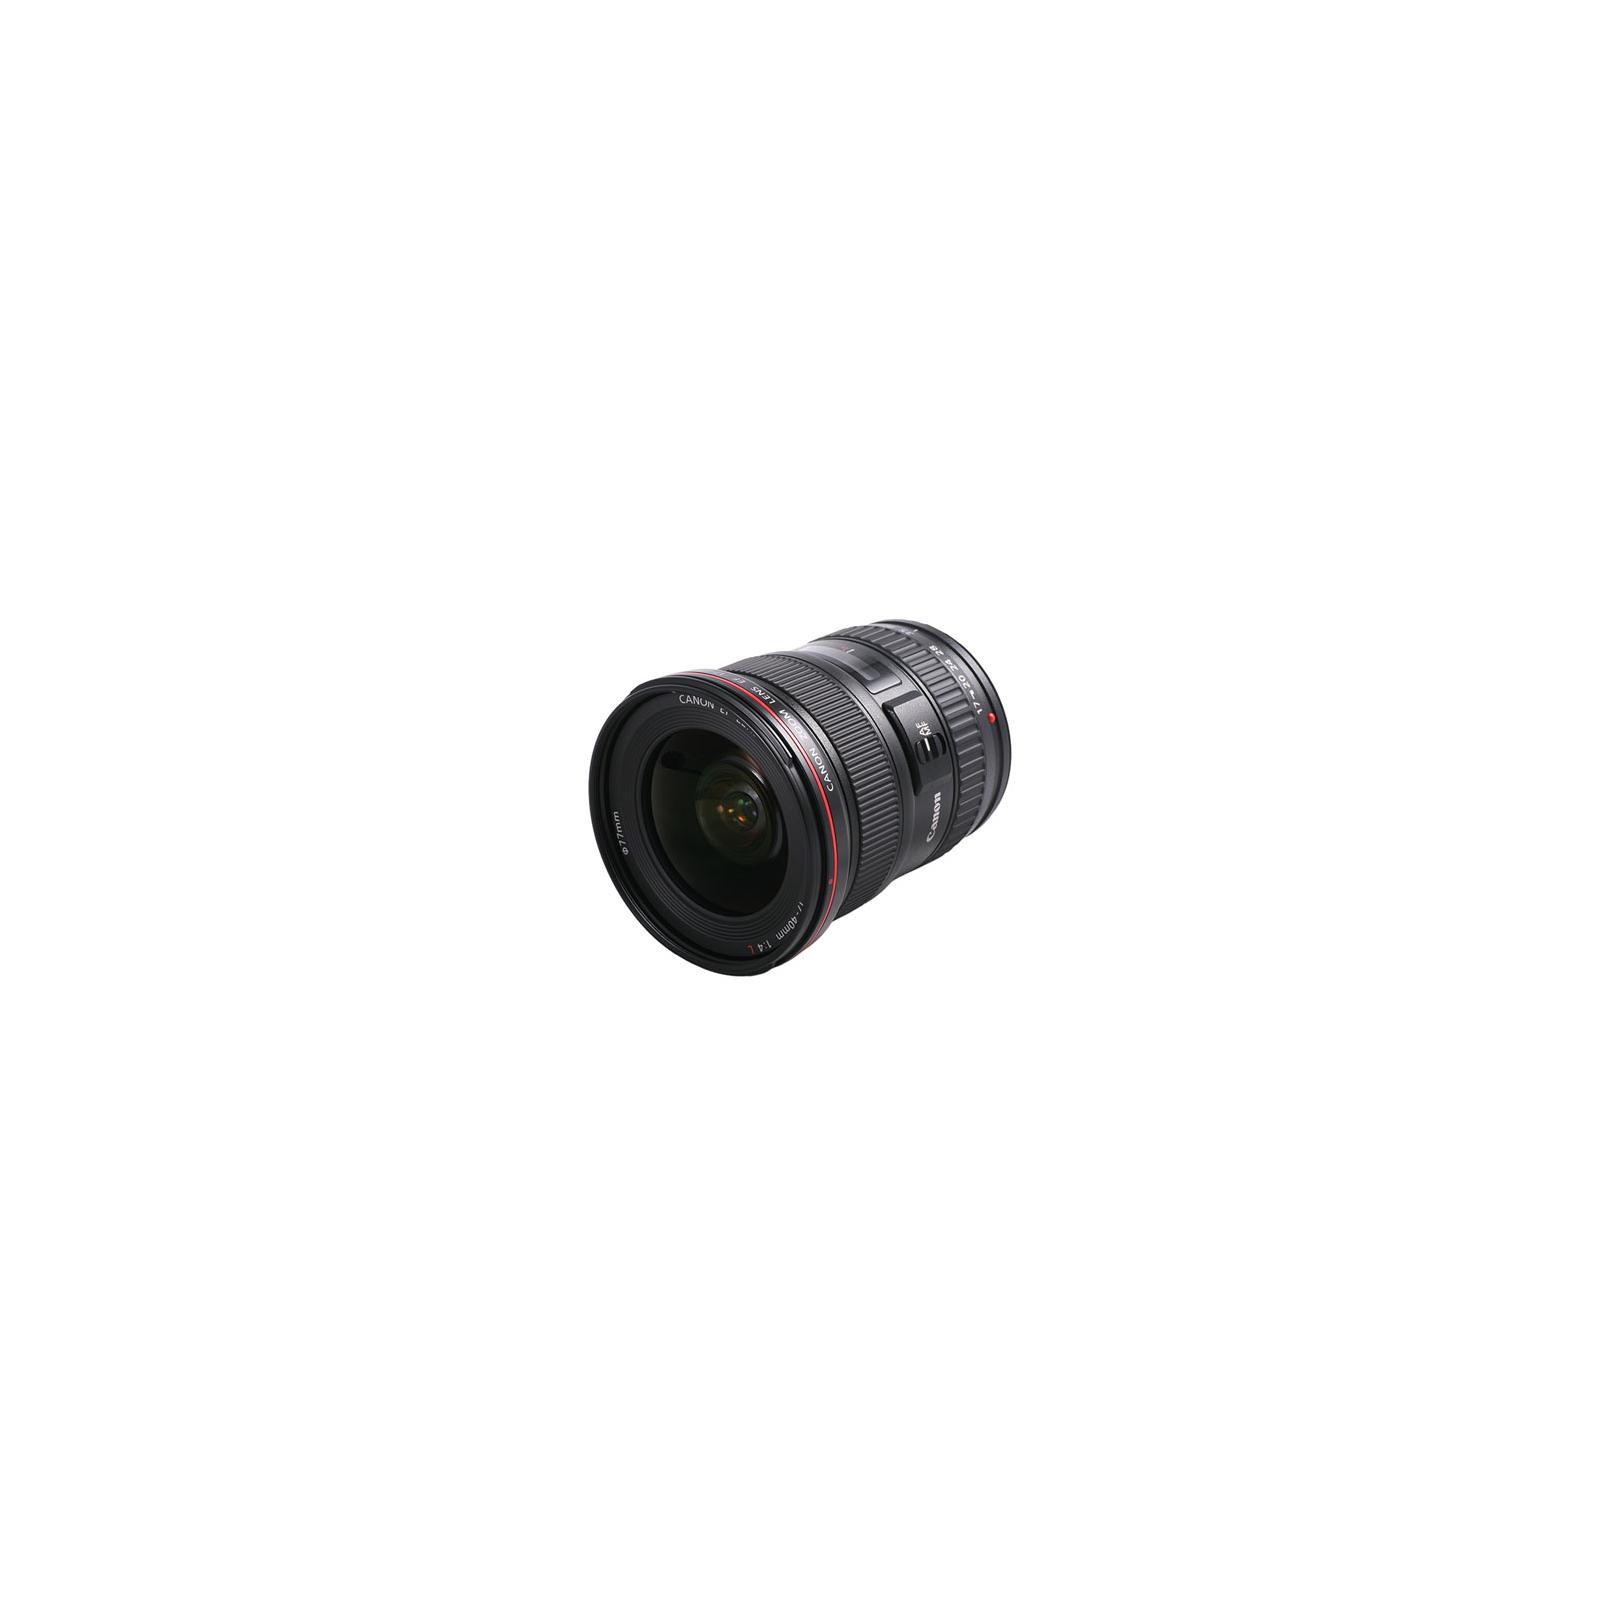 Объектив EF 17-40mm f/4L USM Canon (8806A007 / 8806A003)